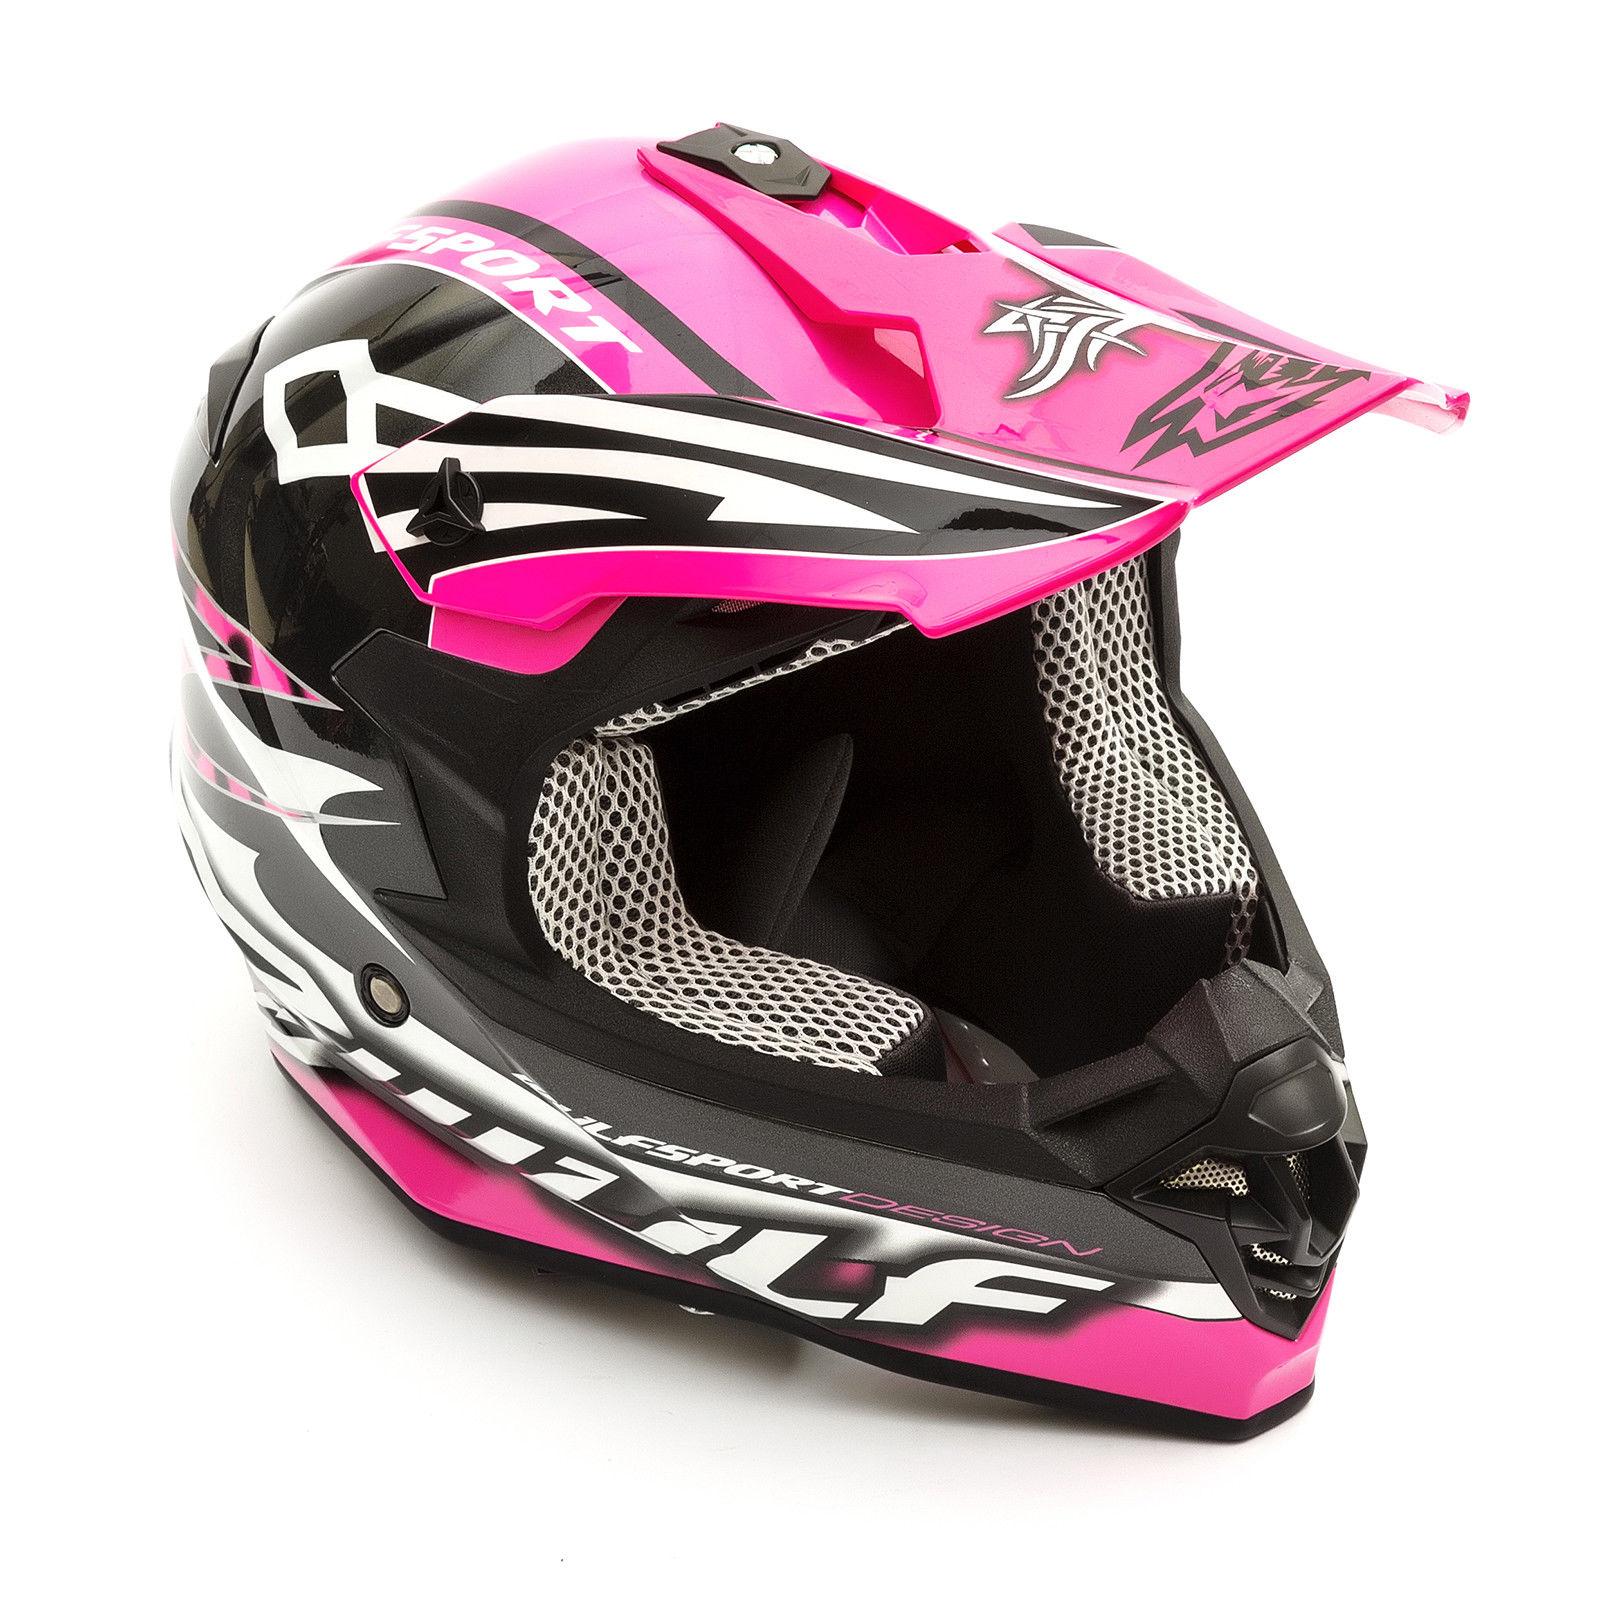 Wulfsport-Adult-Sceptre-Helmets-Motocross-Pitbike-Motorbike-Off-Road-Racing-ATV thumbnail 45